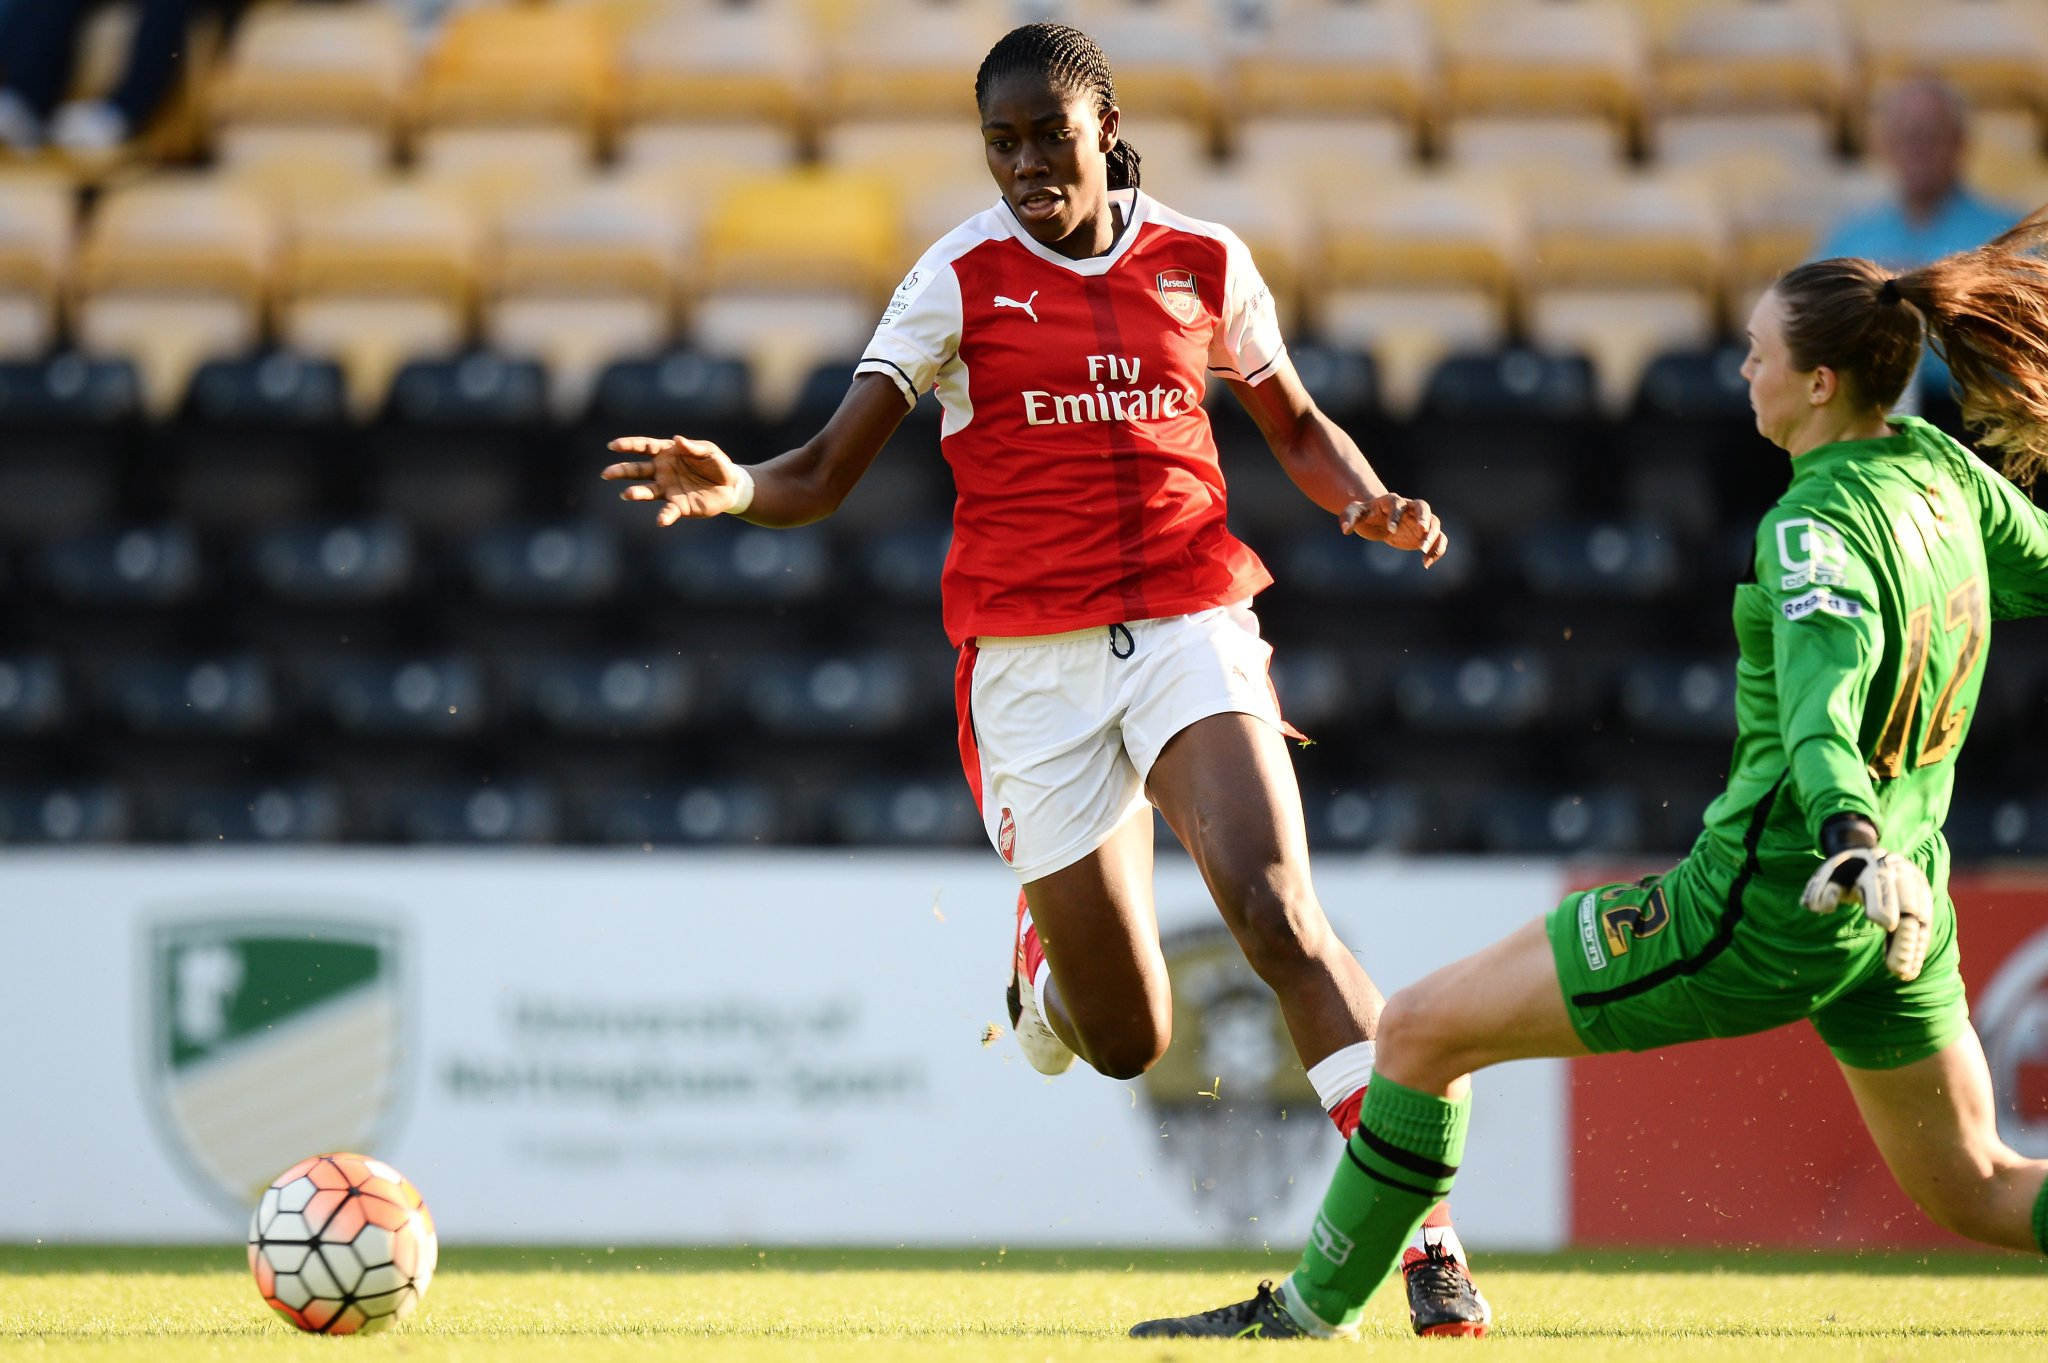 Oshoala Impressive But Arsenal Fall To Man City